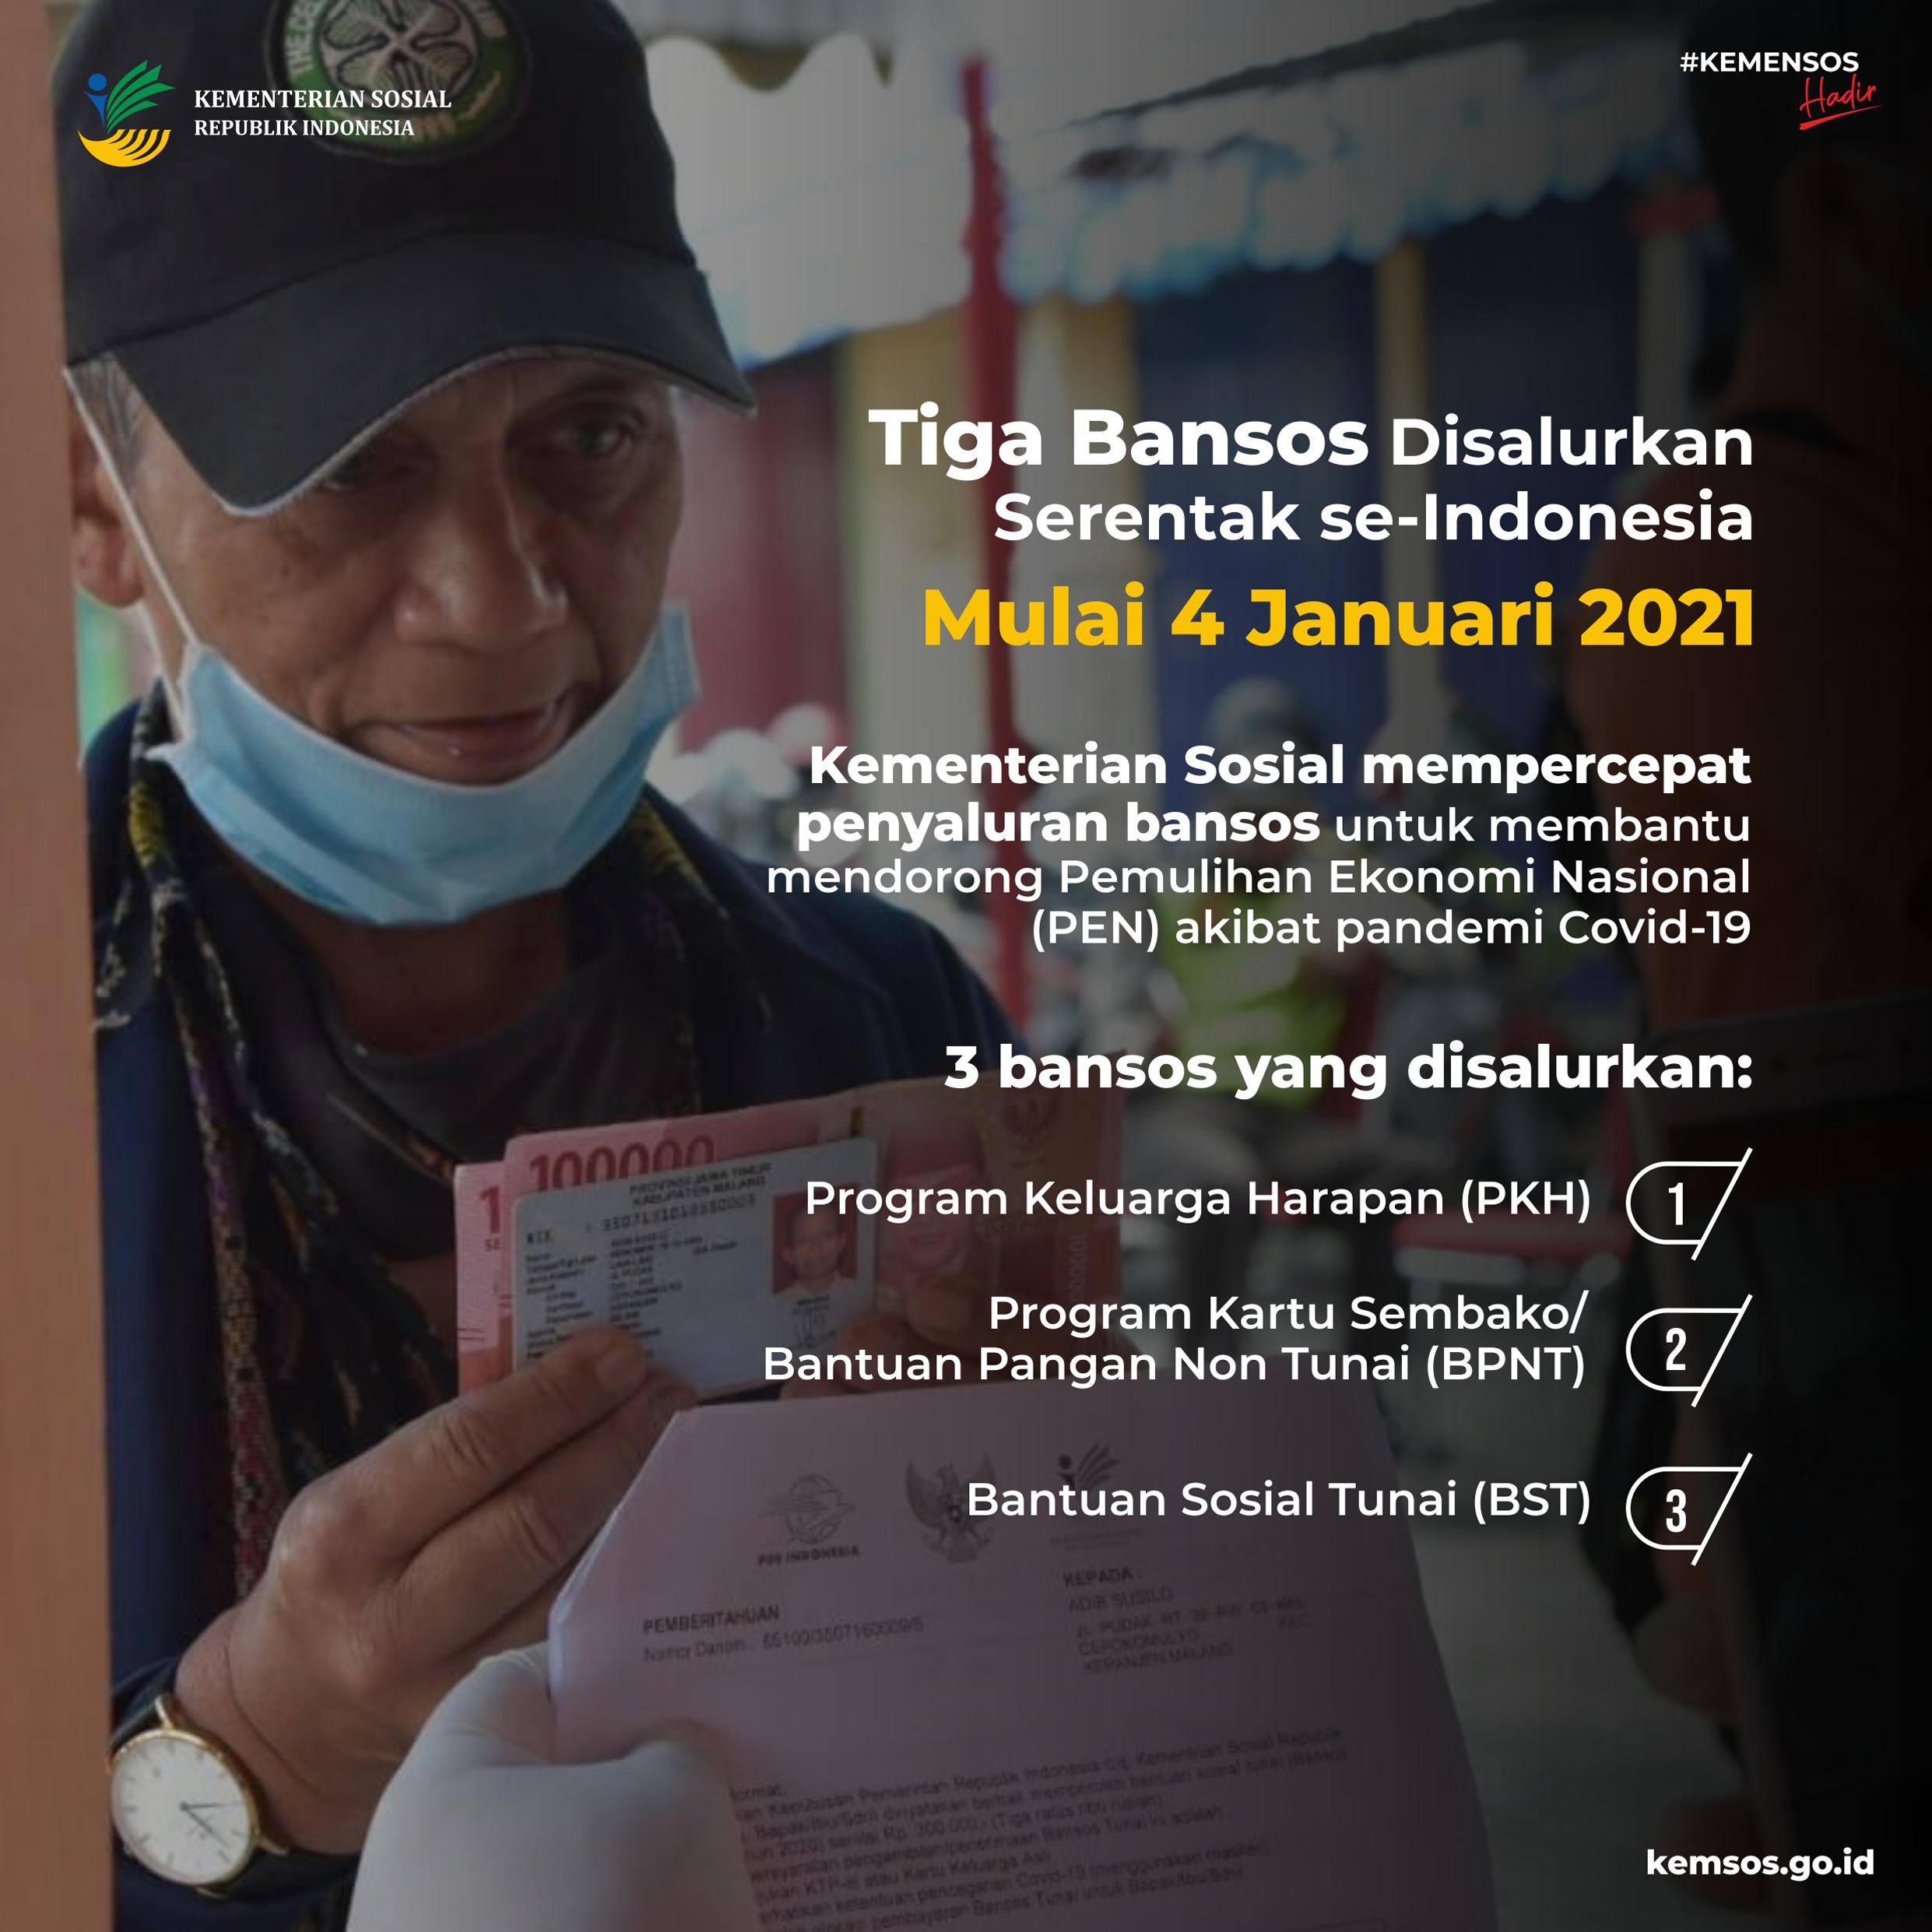 3 Bansos Disalurkan Mulai 4 Januari